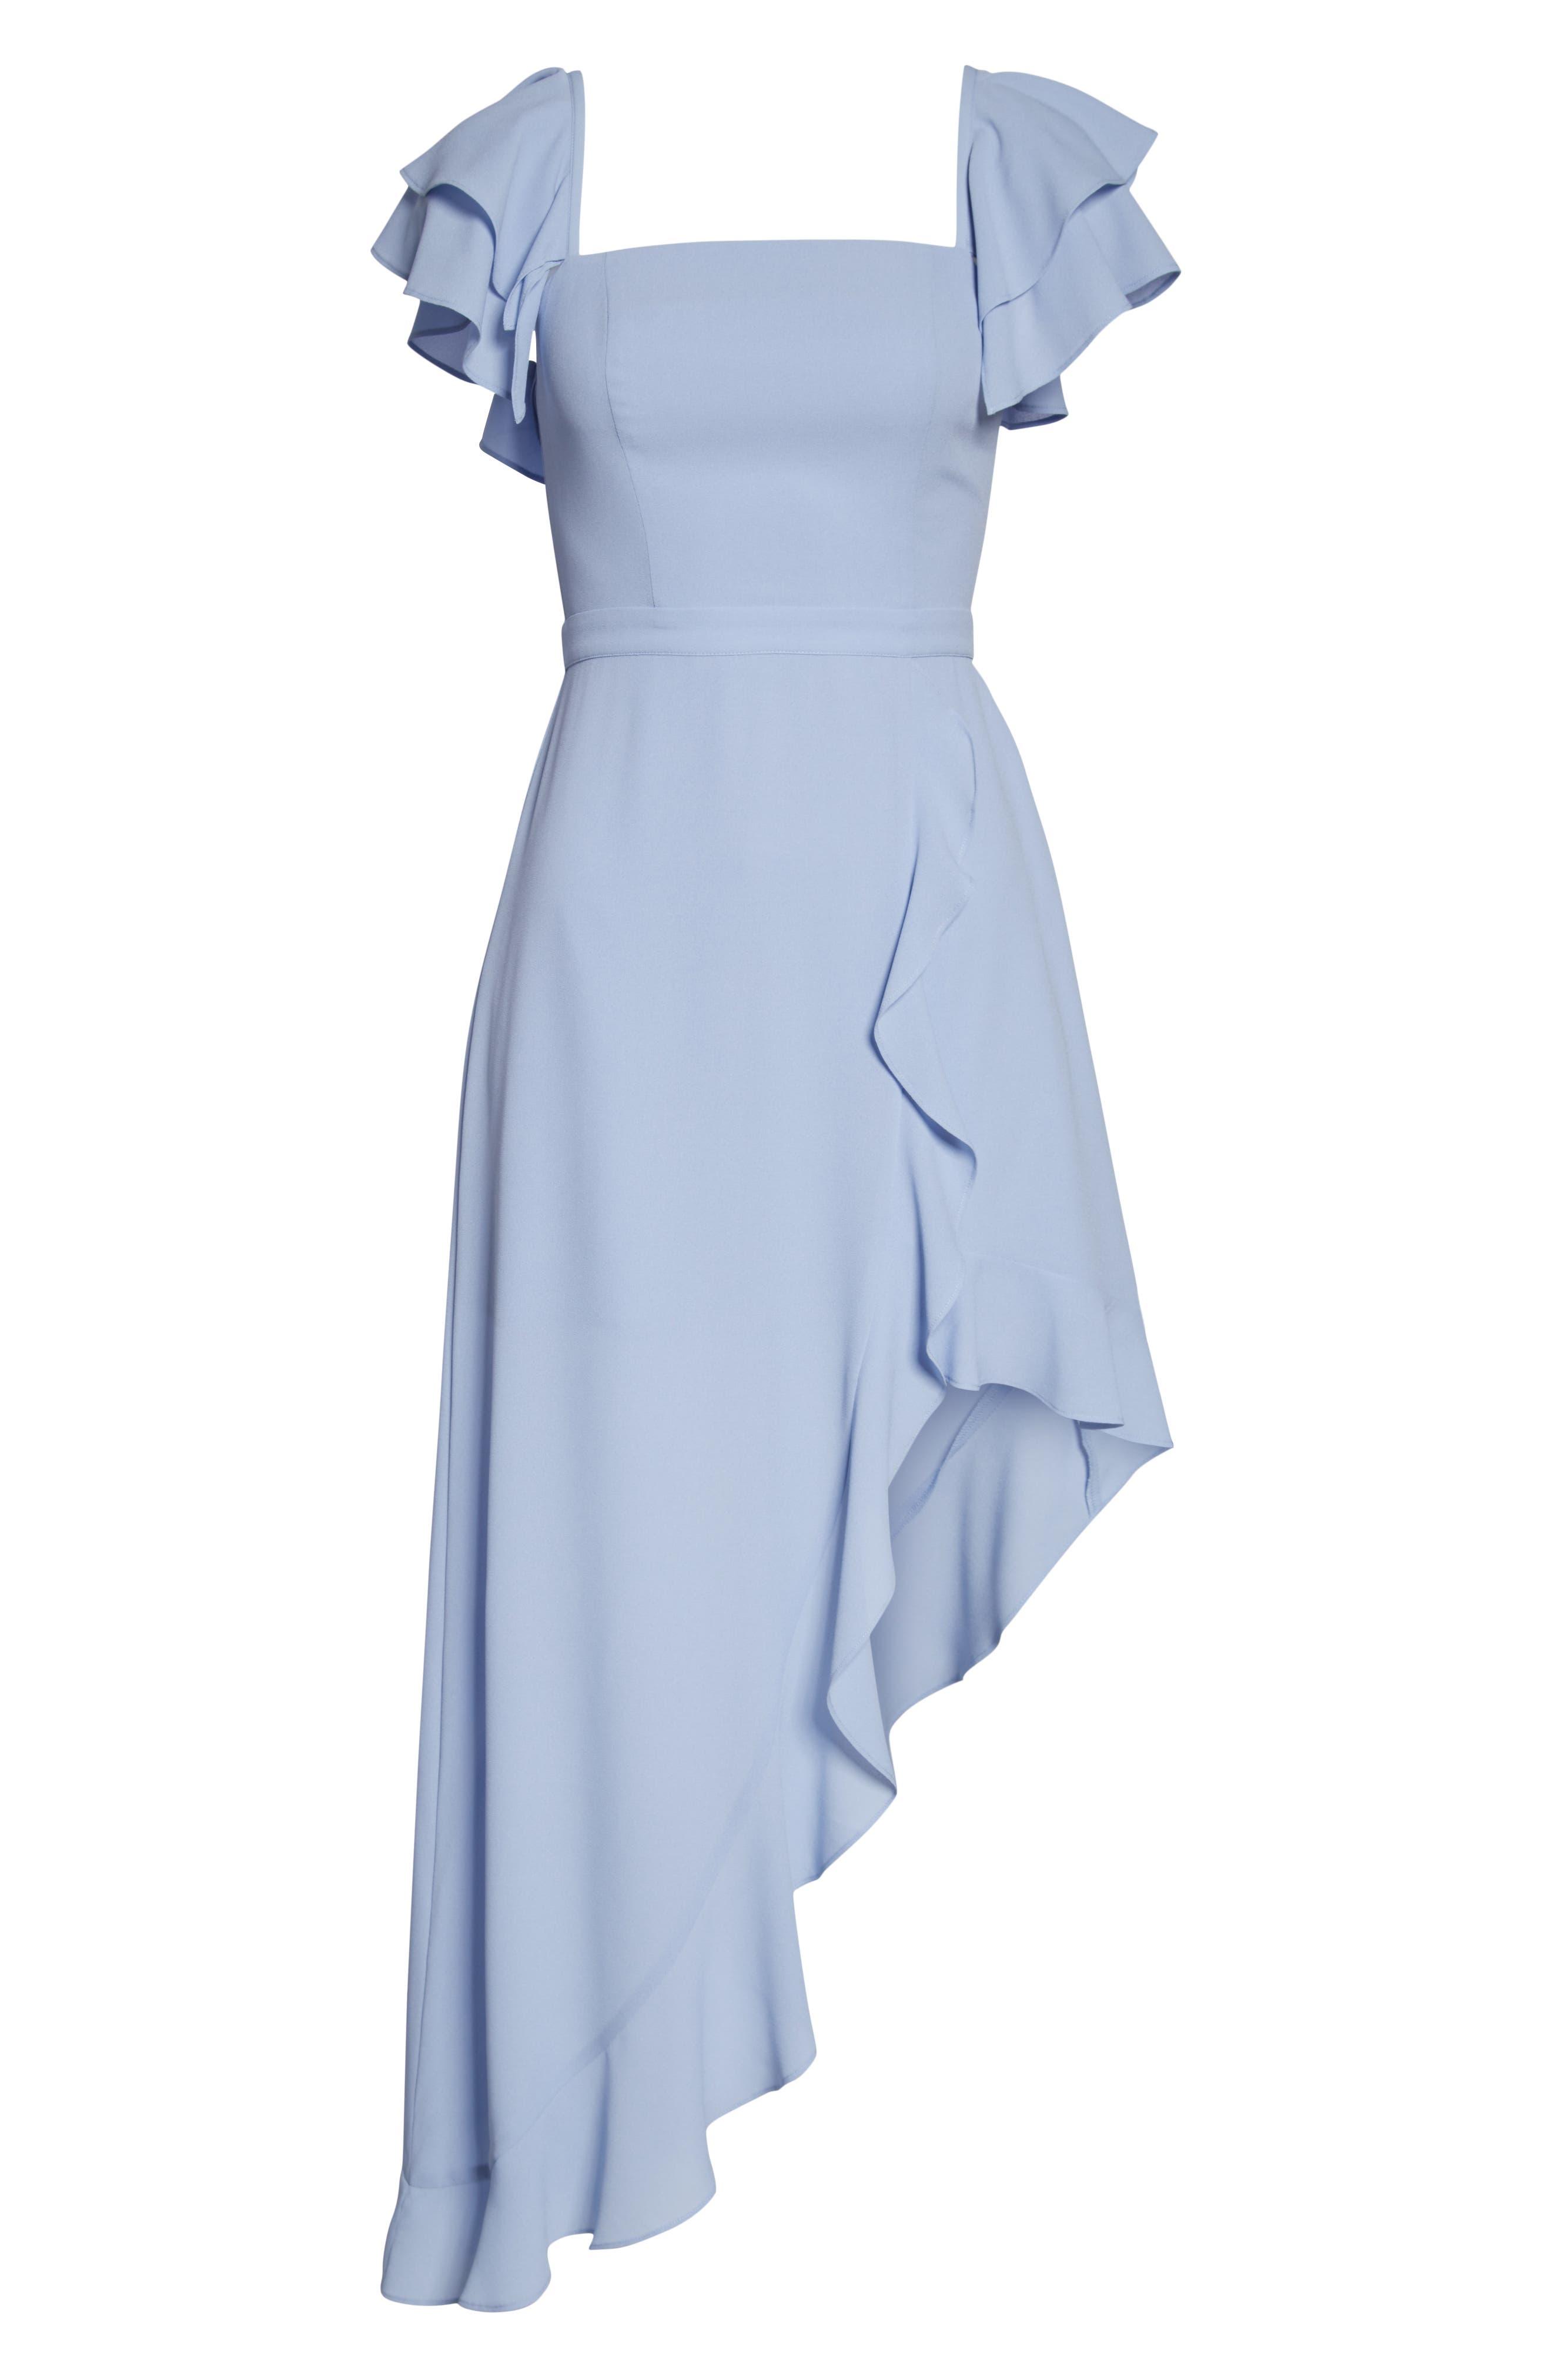 ALI & JAY, Terrace Time Asymmetrical Maxi Dress, Alternate thumbnail 7, color, 400